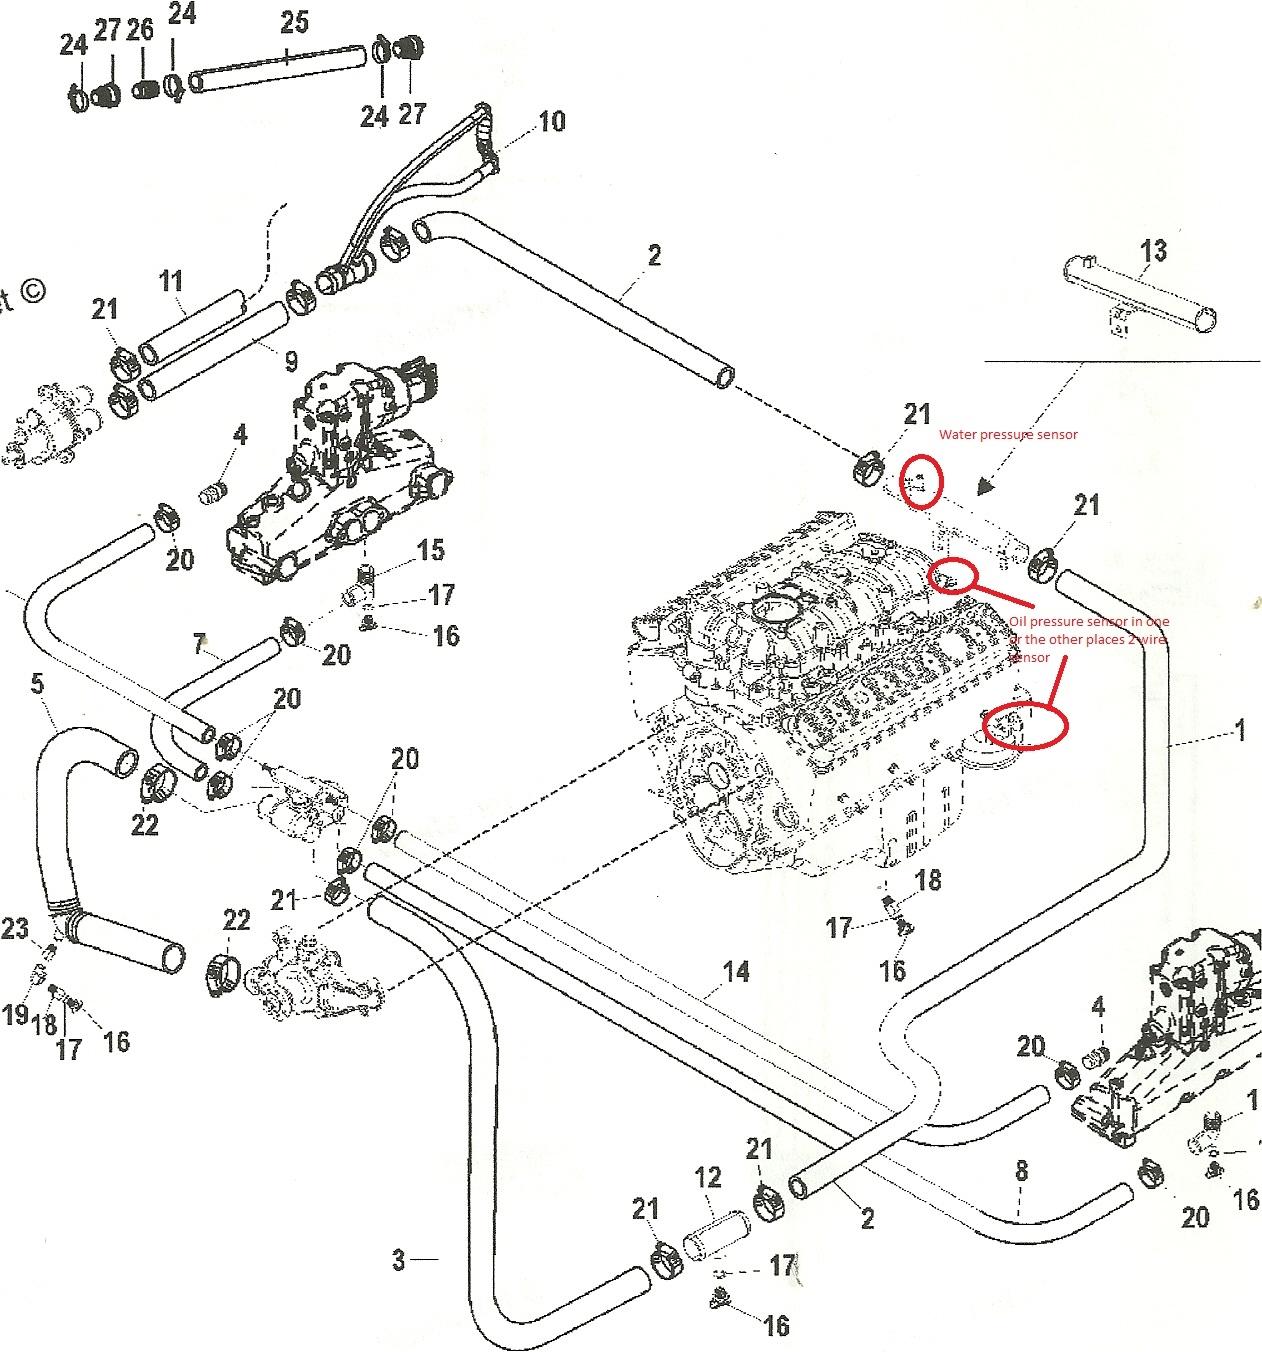 Mercruiser Oil Pressure Sensor Wiring Trusted Diagrams Gauge Diagram Water Circuit Symbols U2022 Starter